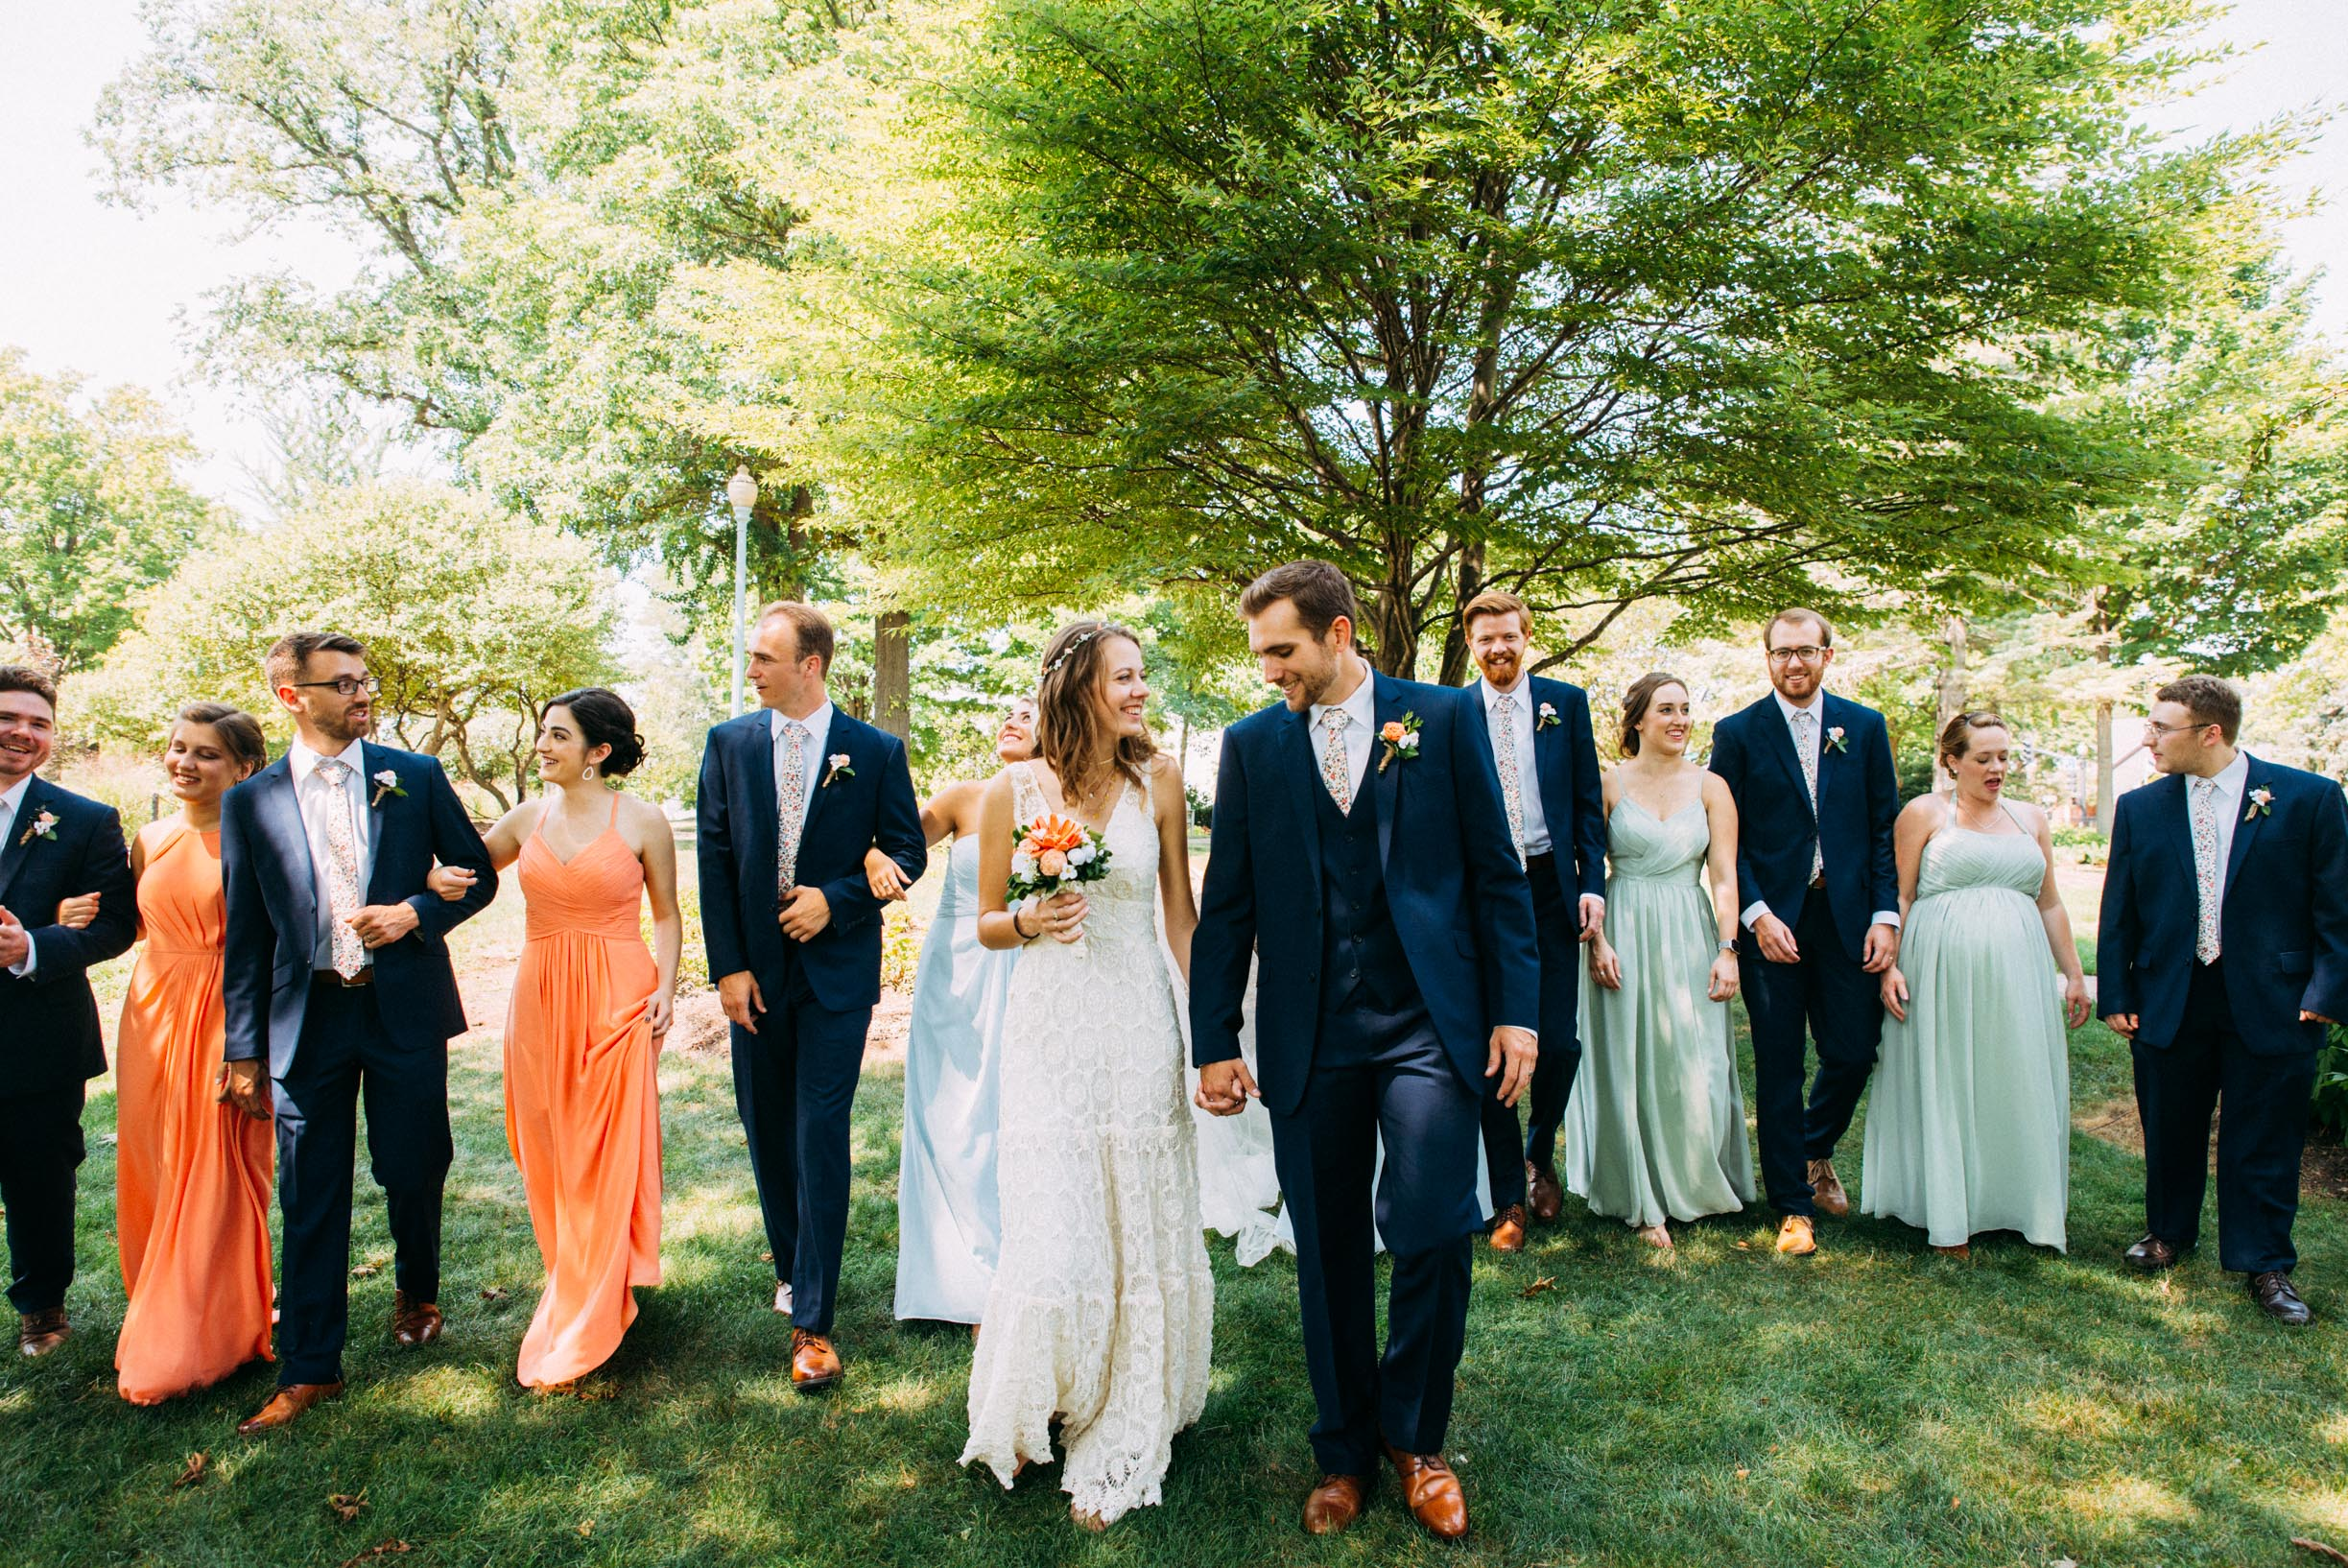 Rachel Josh Wedding Party Portrait Blog-20.jpg